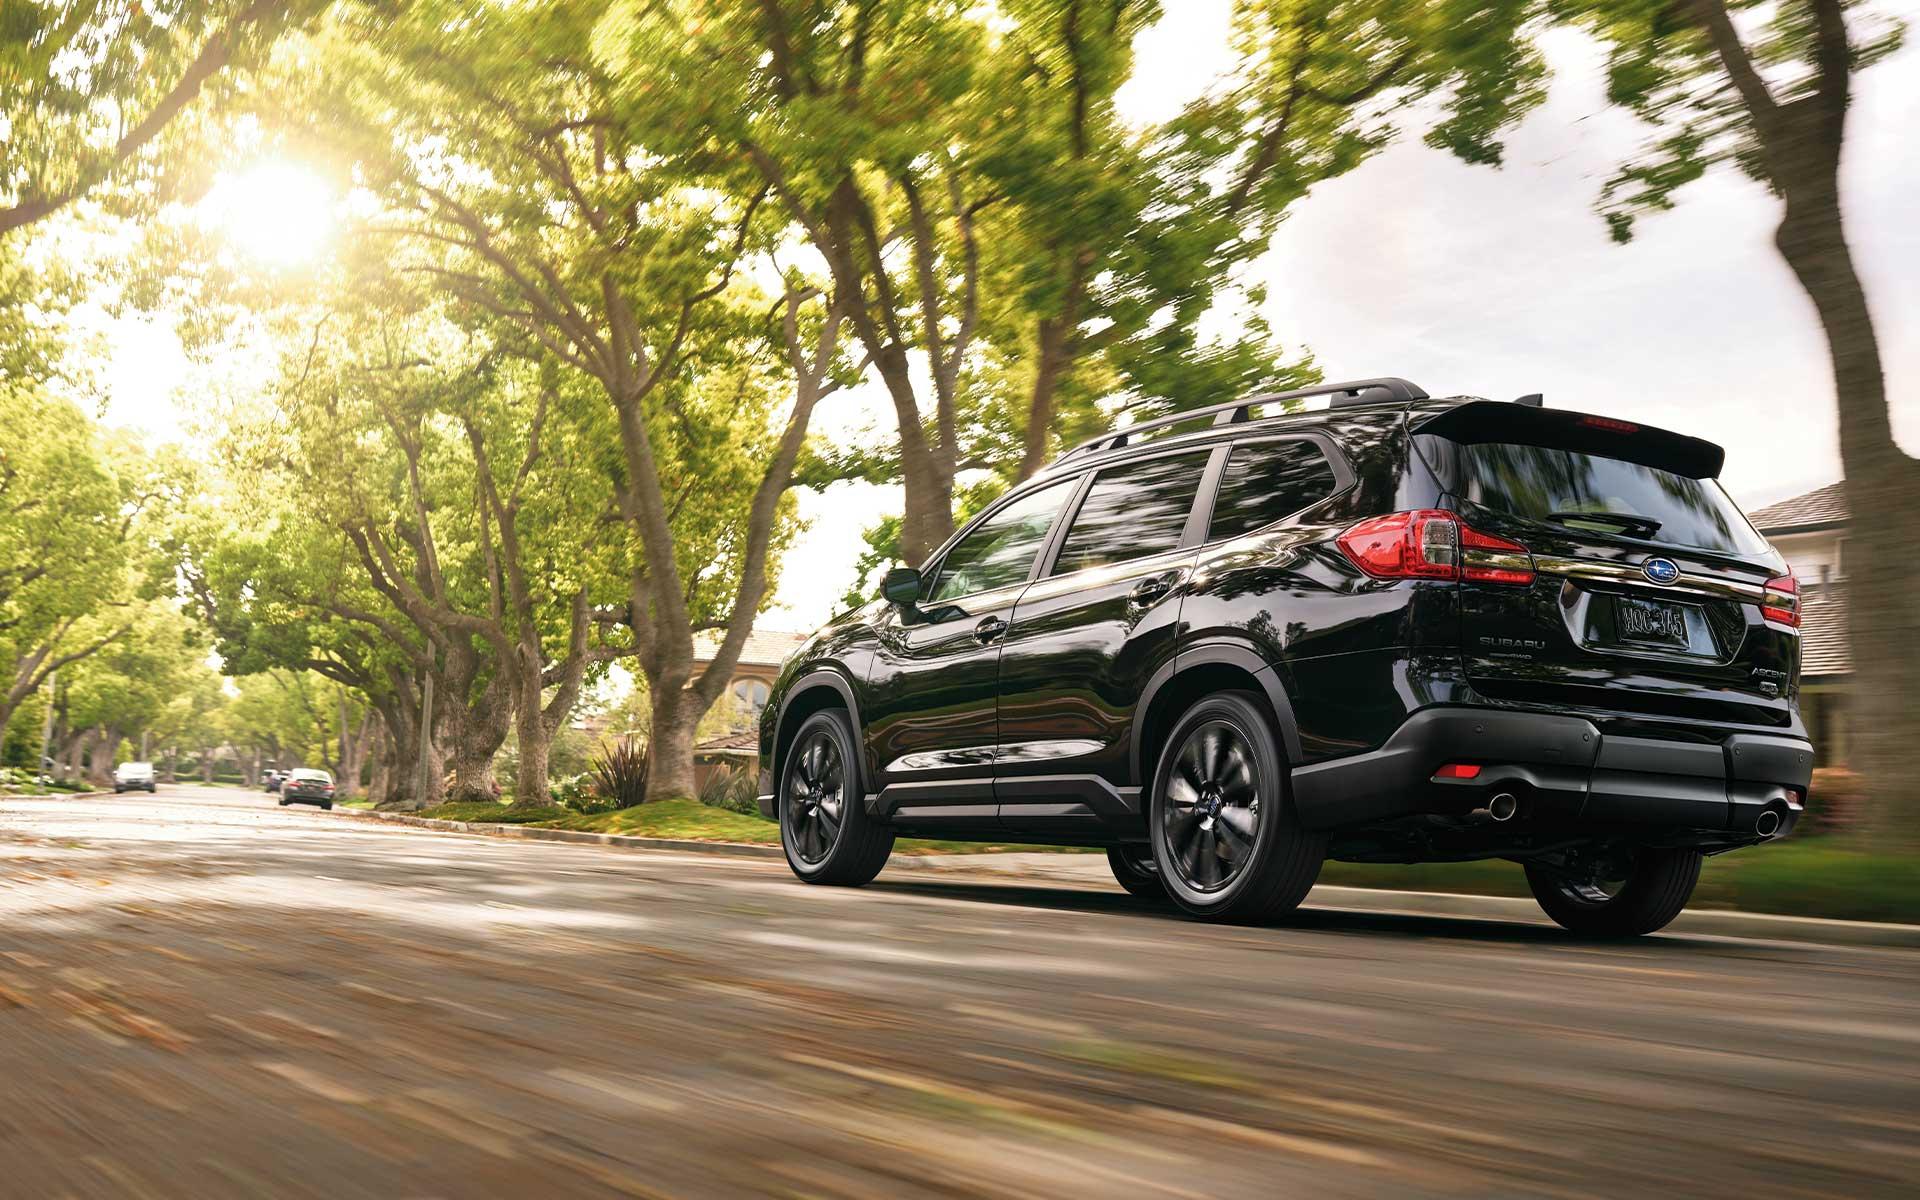 A Subaru Ascent Onyx Edition driving through a neighborhood.